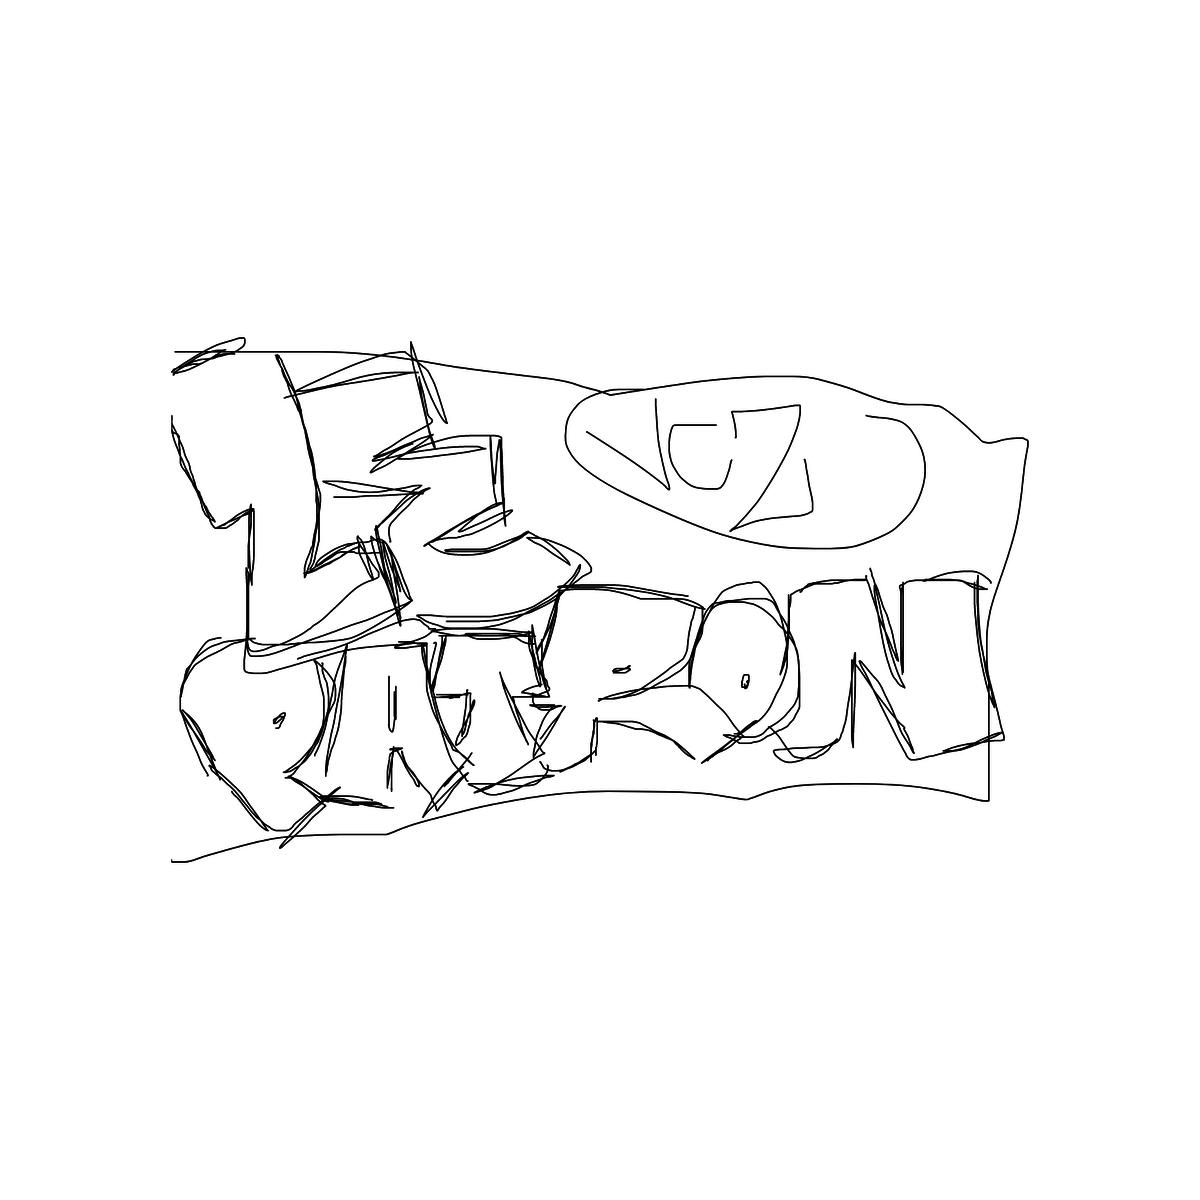 BAAAM drawing#23837 lat:43.4417762756347660lng: 6.7866654396057130